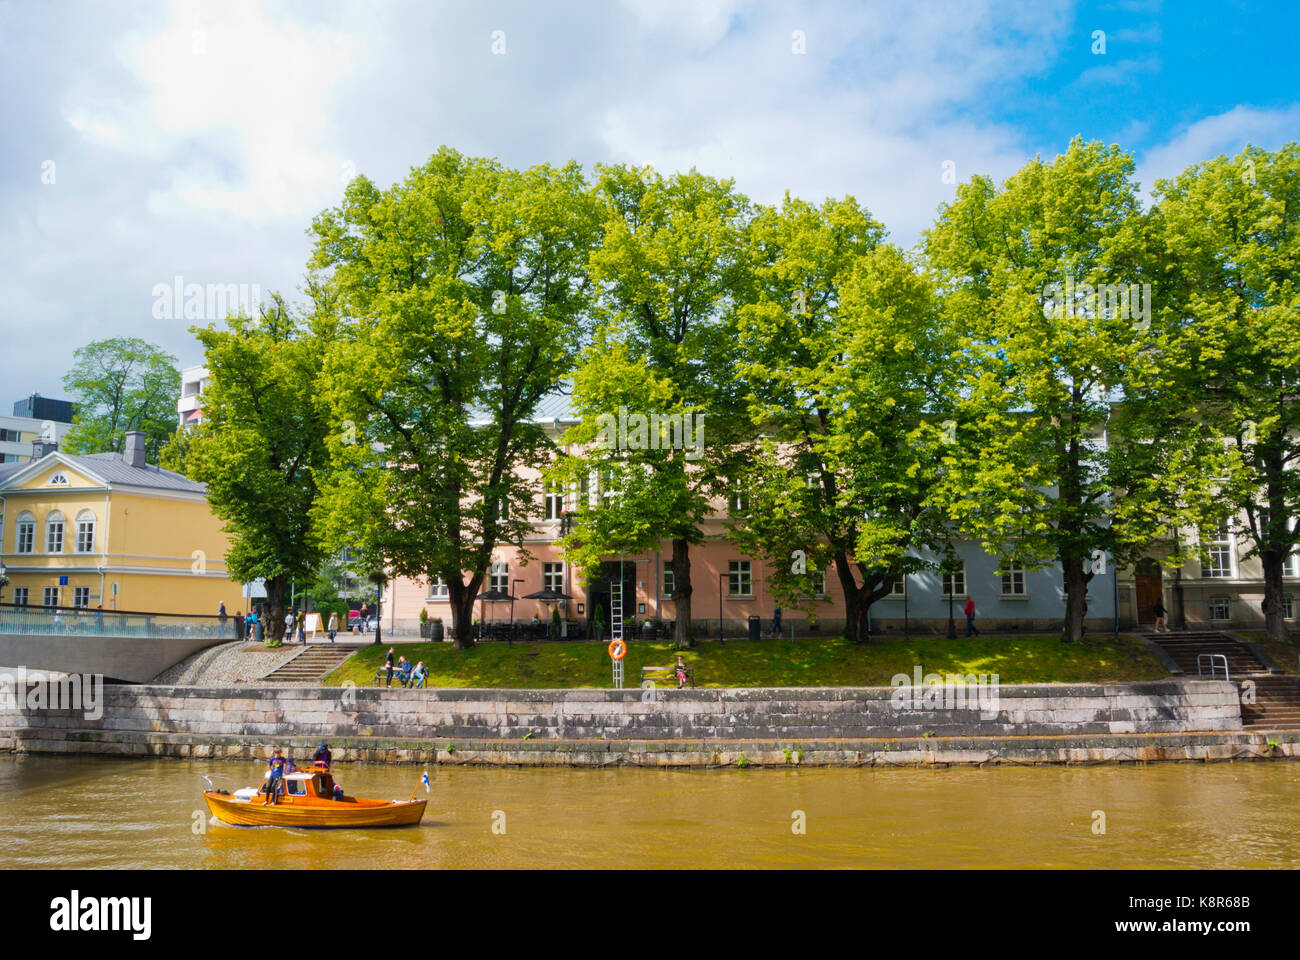 Aurajoki, River Aura, Turku, western Finland - Stock Image